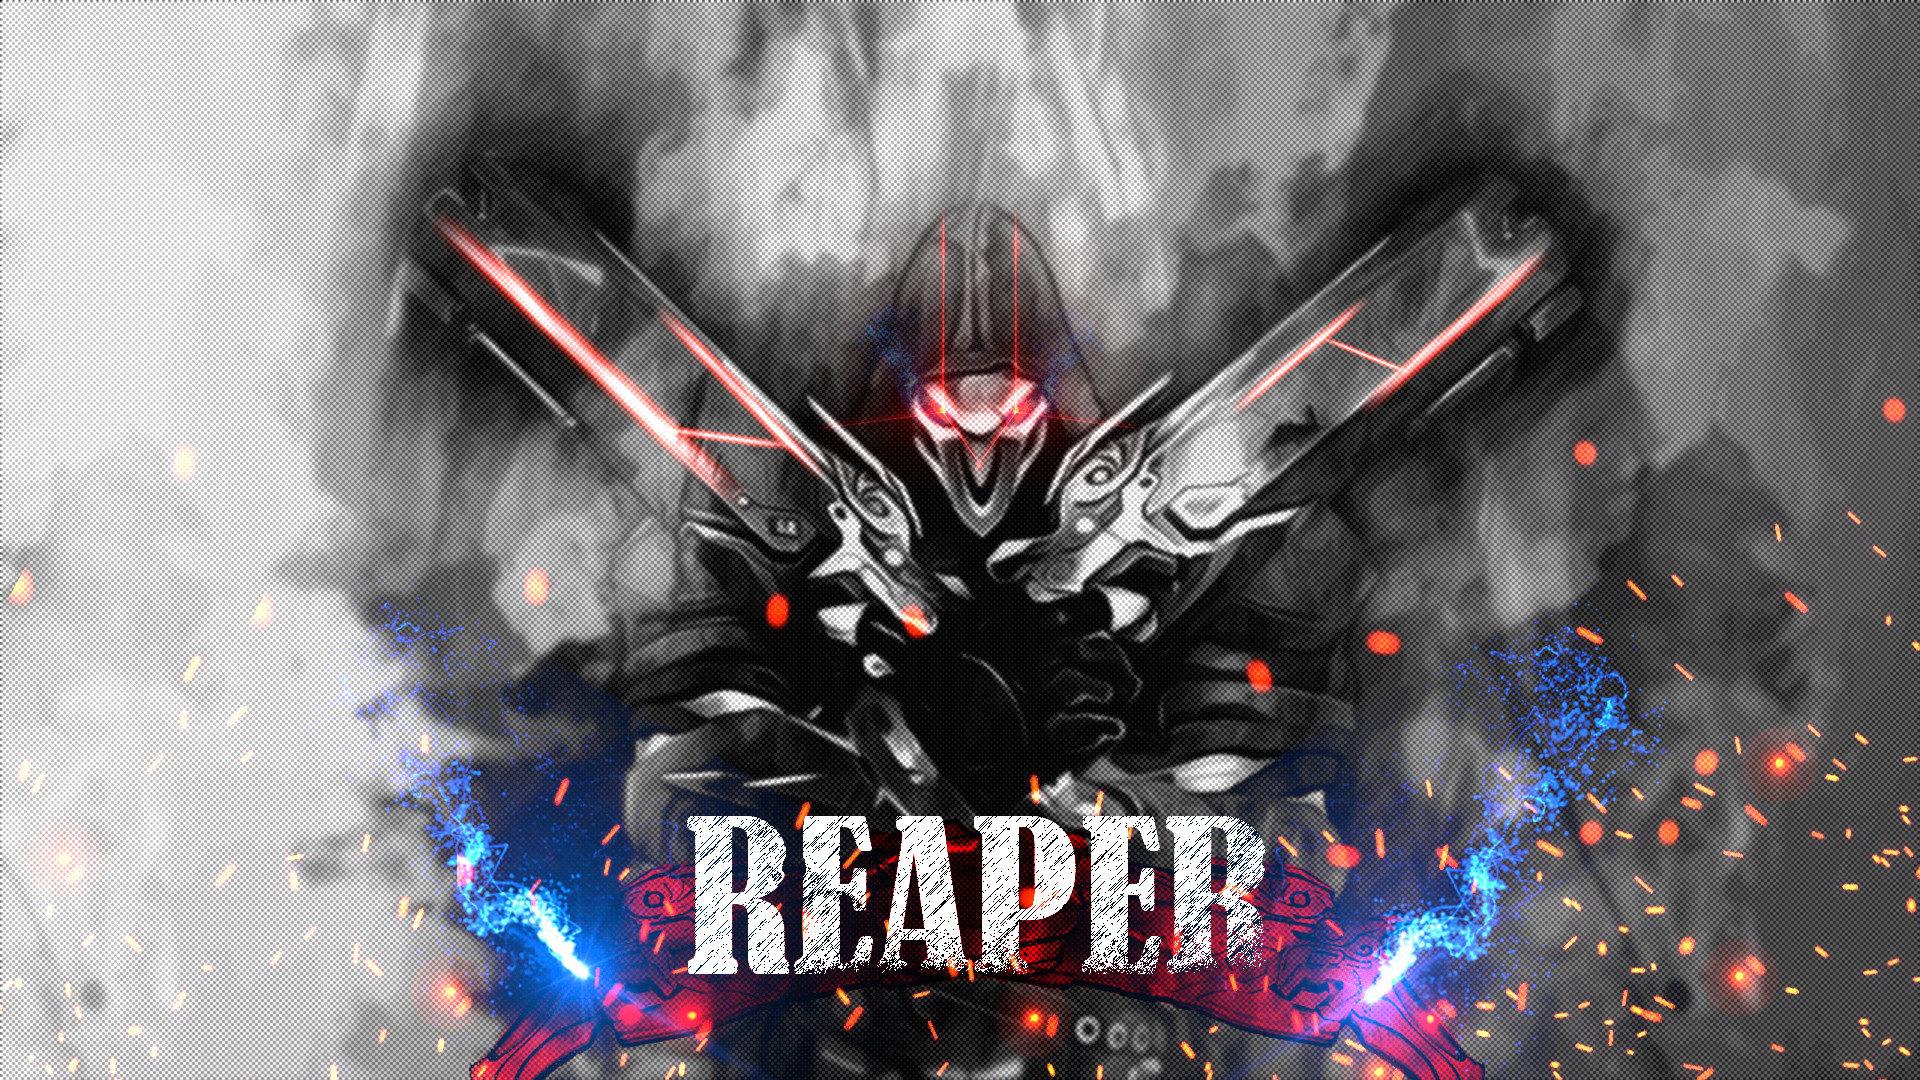 Best Reaper Overwatch Wallpaper Id169942 For High